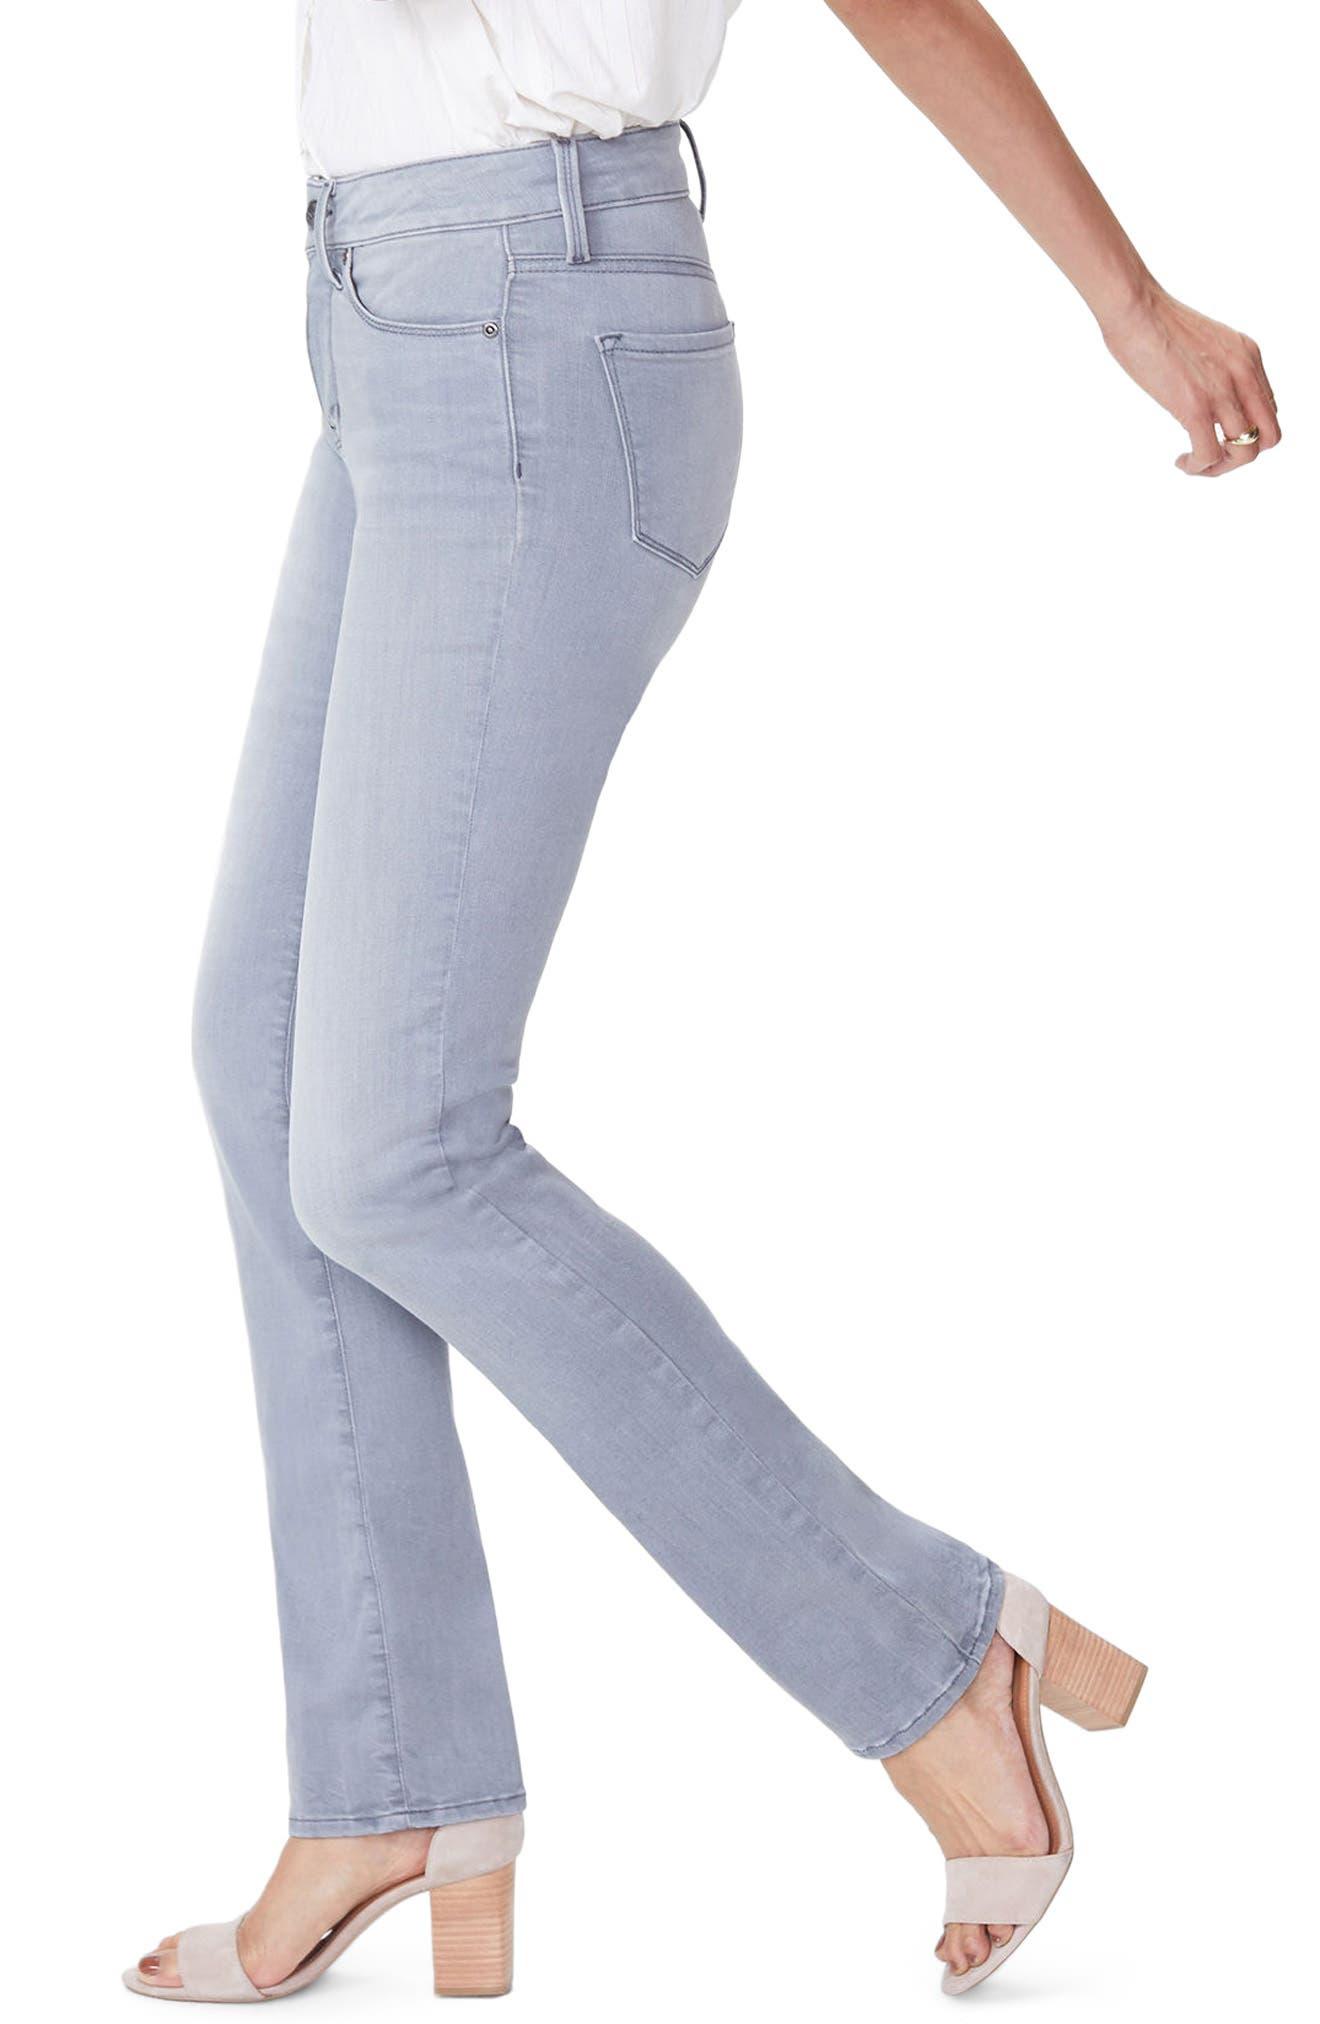 Marilyn Stretch Straight Leg Jeans,                             Alternate thumbnail 3, color,                             Carbon Beach